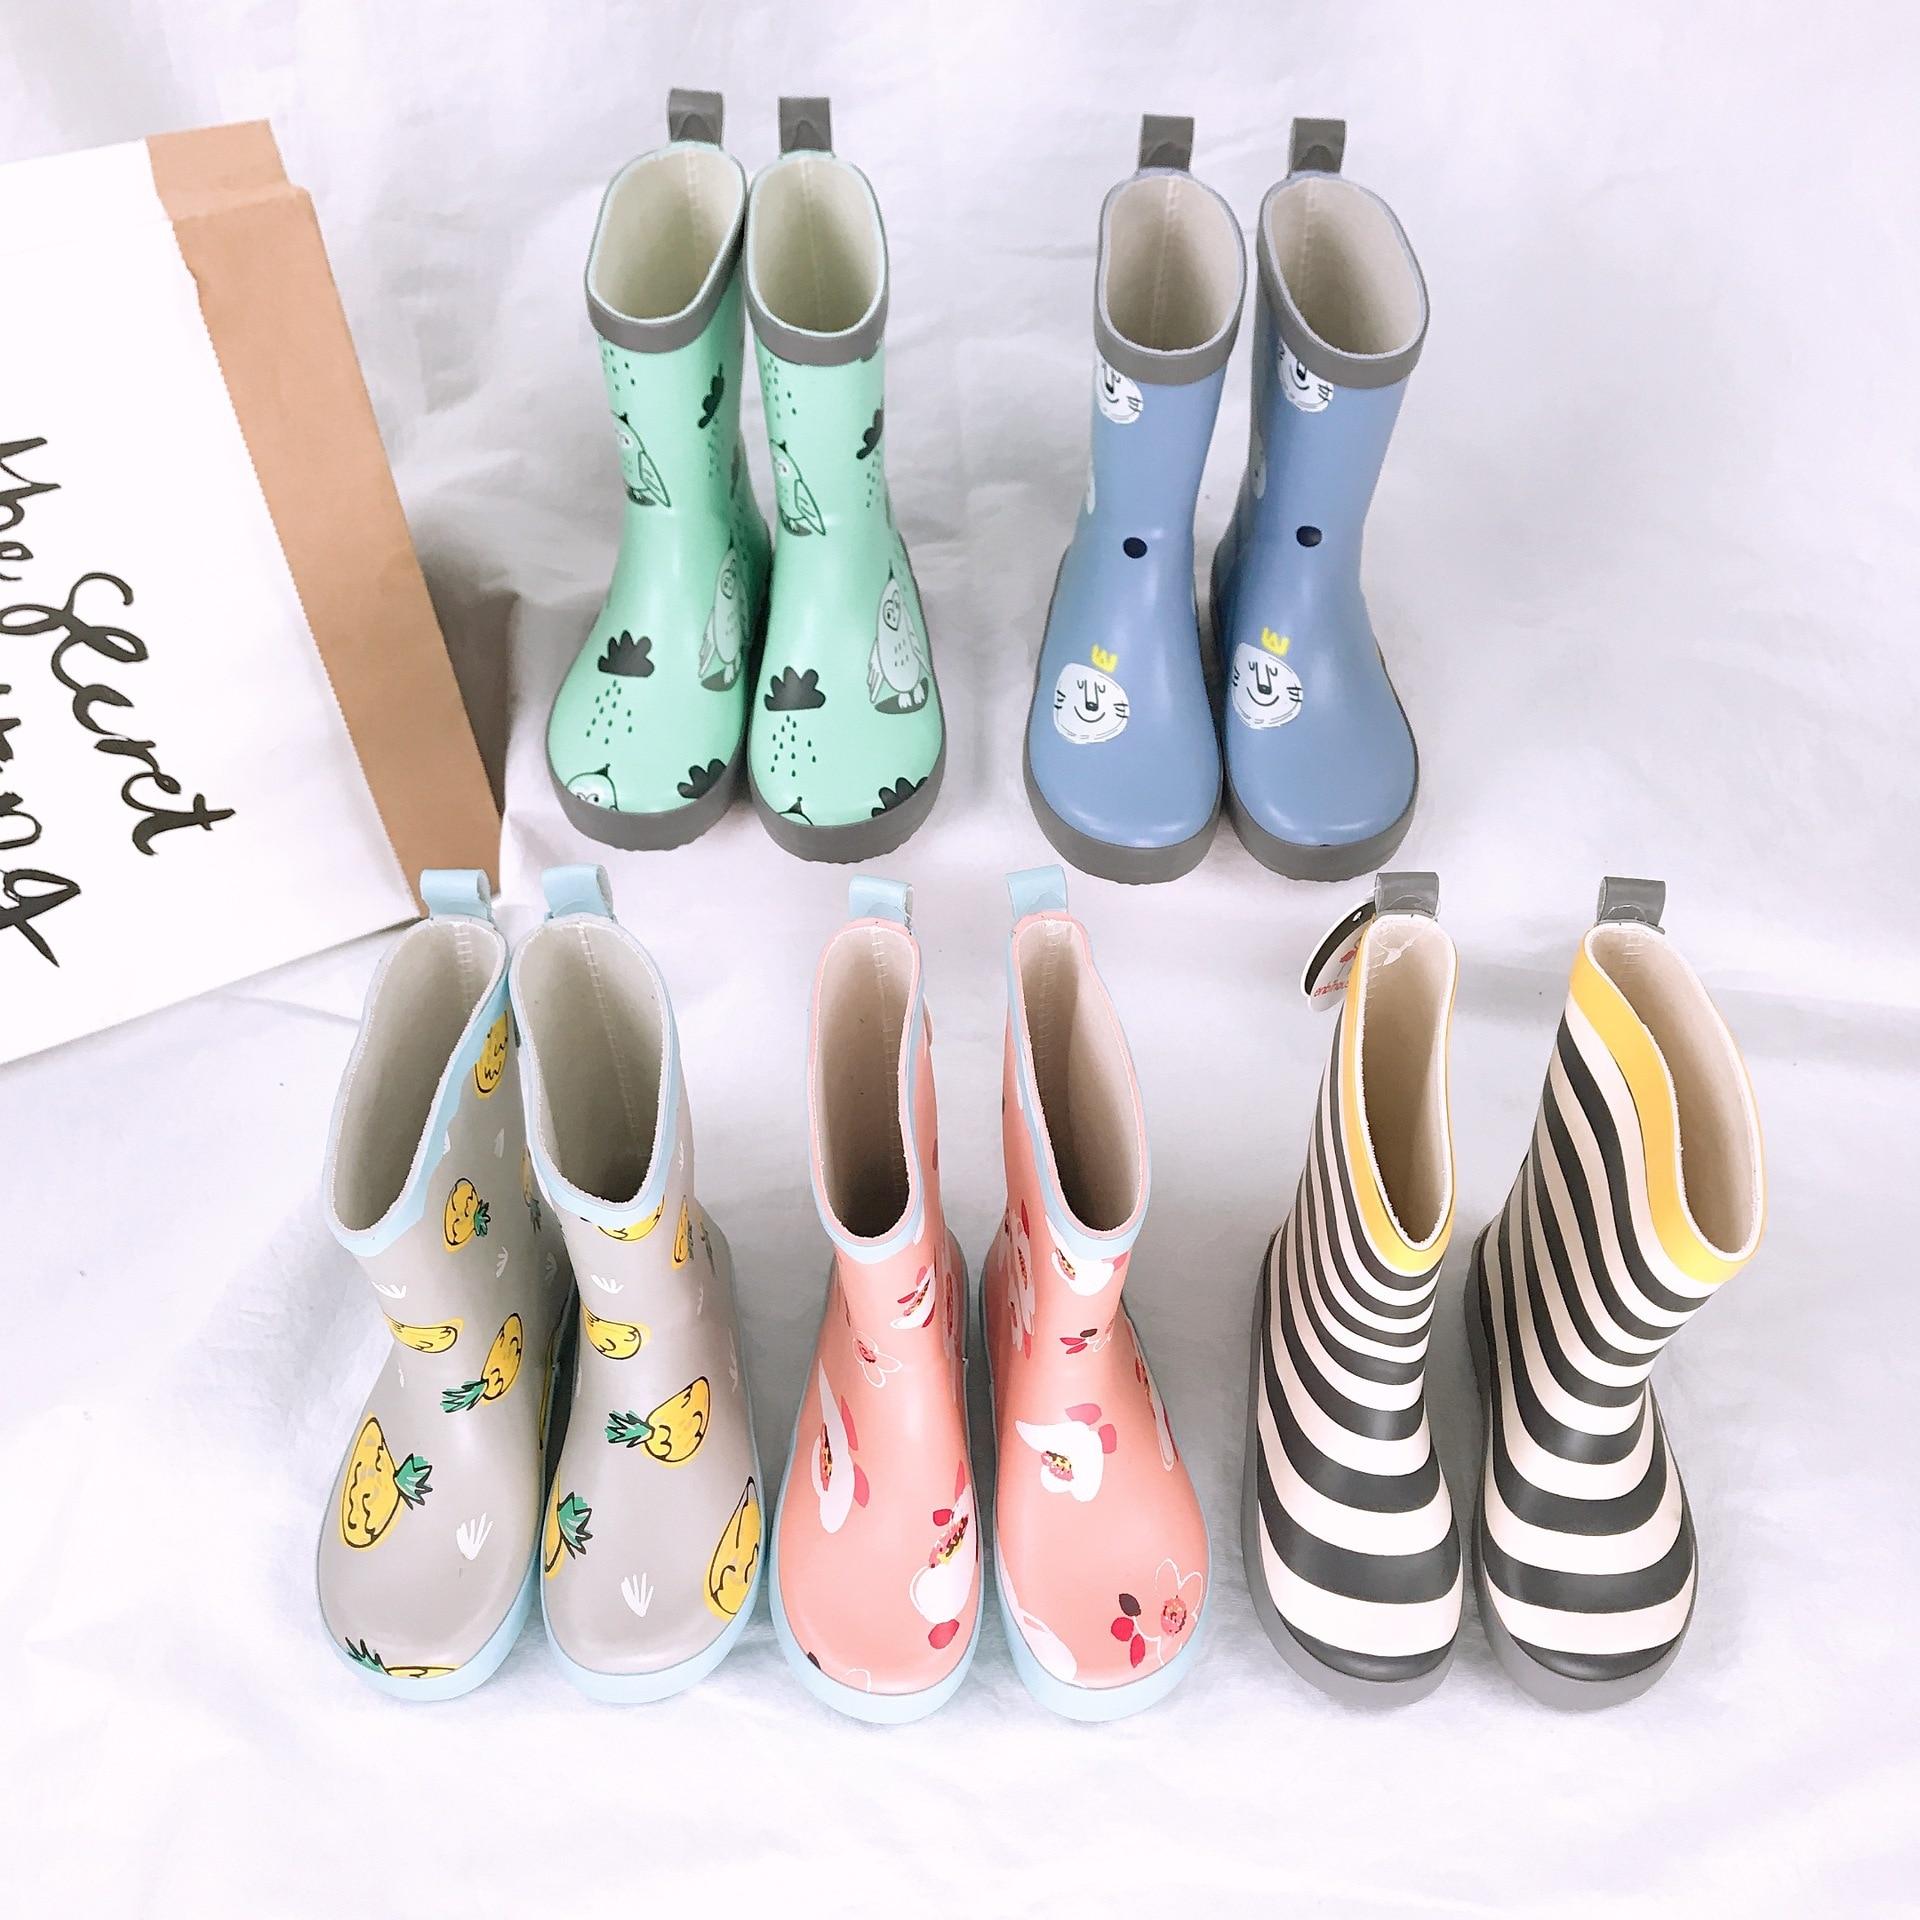 Celveroso Rain Boots Kids Girl Cute Cartoon Printed Children's Rubber Boots Kalosze Dla Dzieci Waterproof Baby Water Shoes